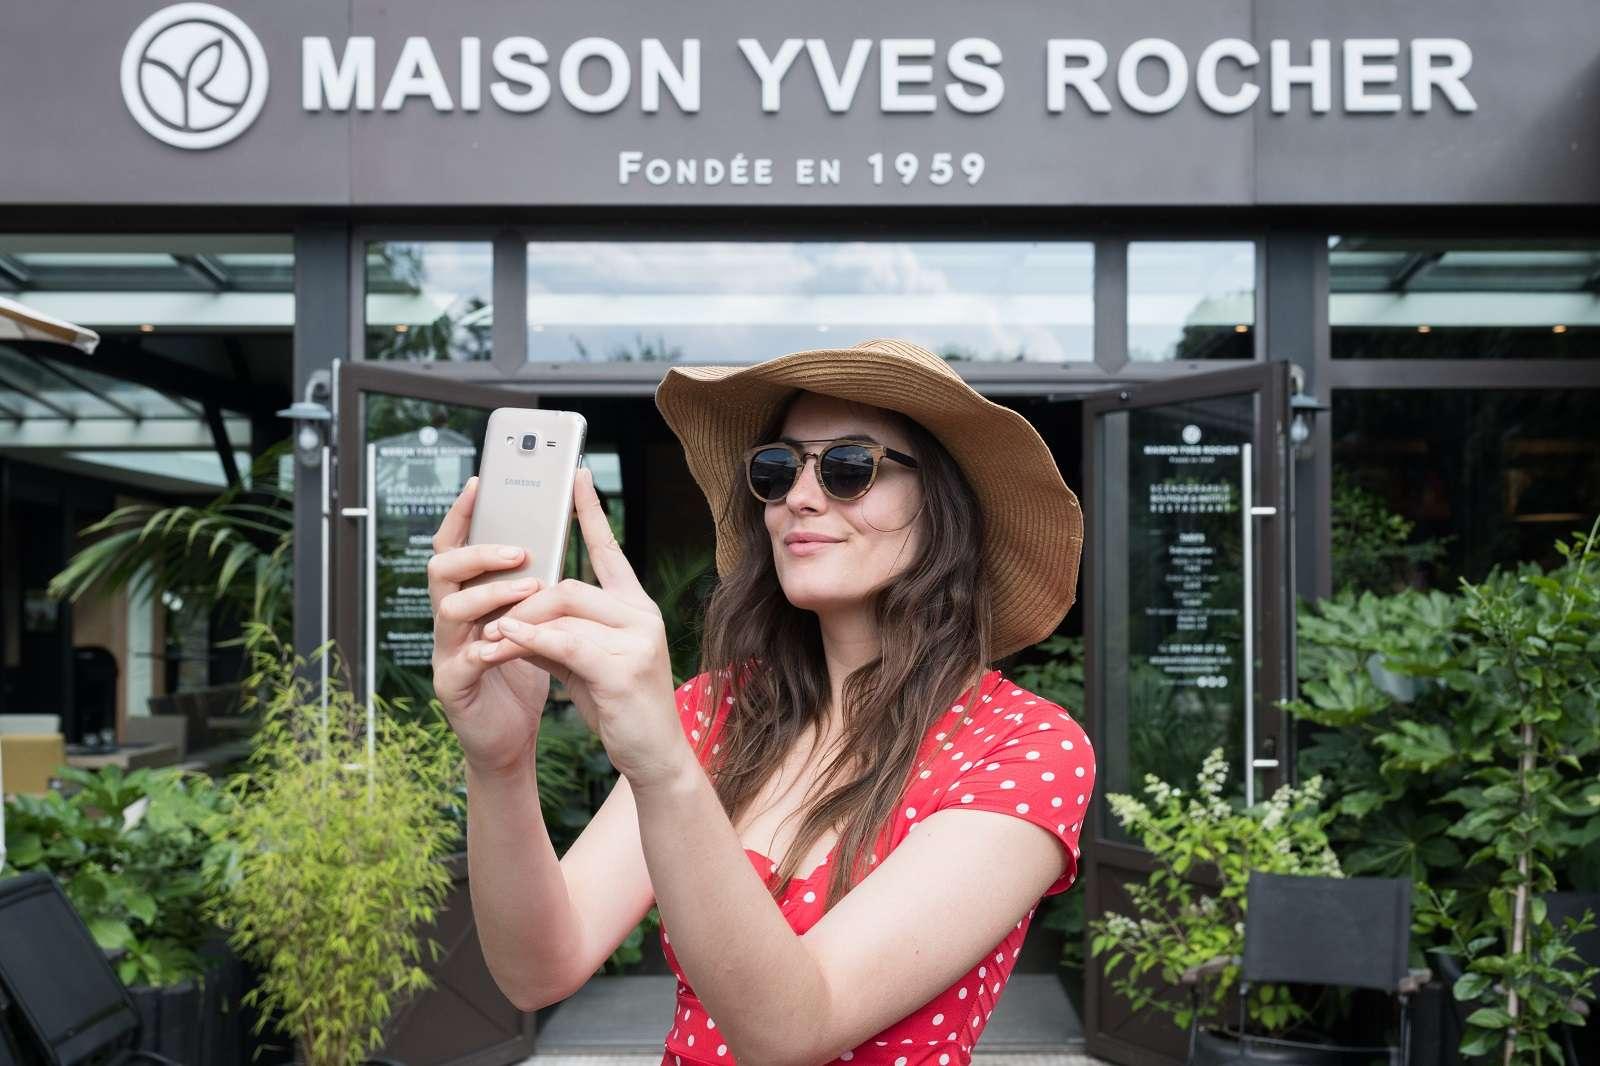 Yves Rocher La Gacilly - Maison Yves Rocher